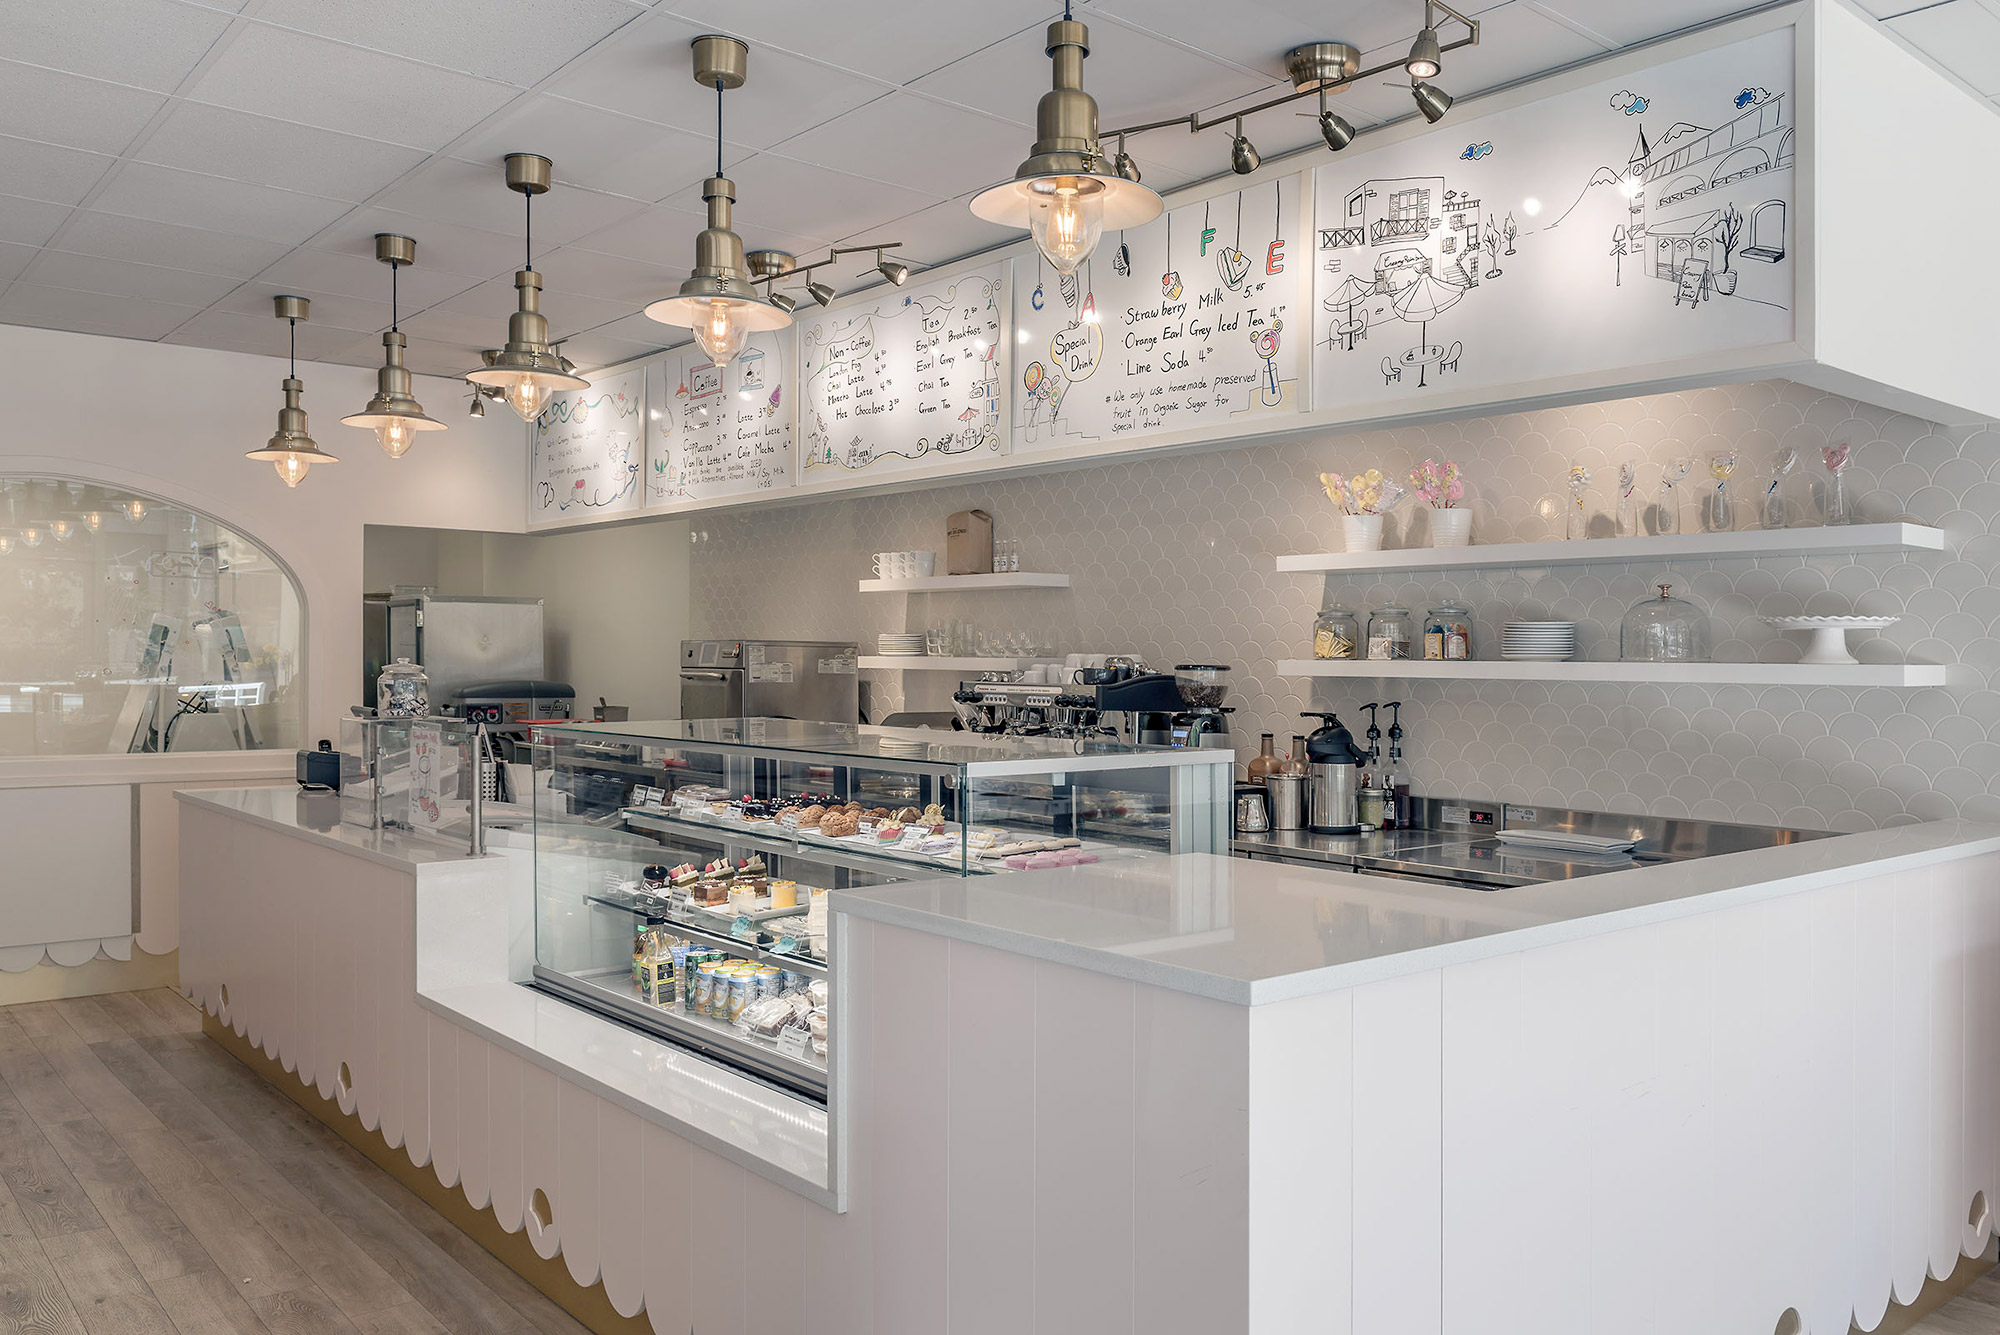 Creamy RainbowBakery and Cafe -